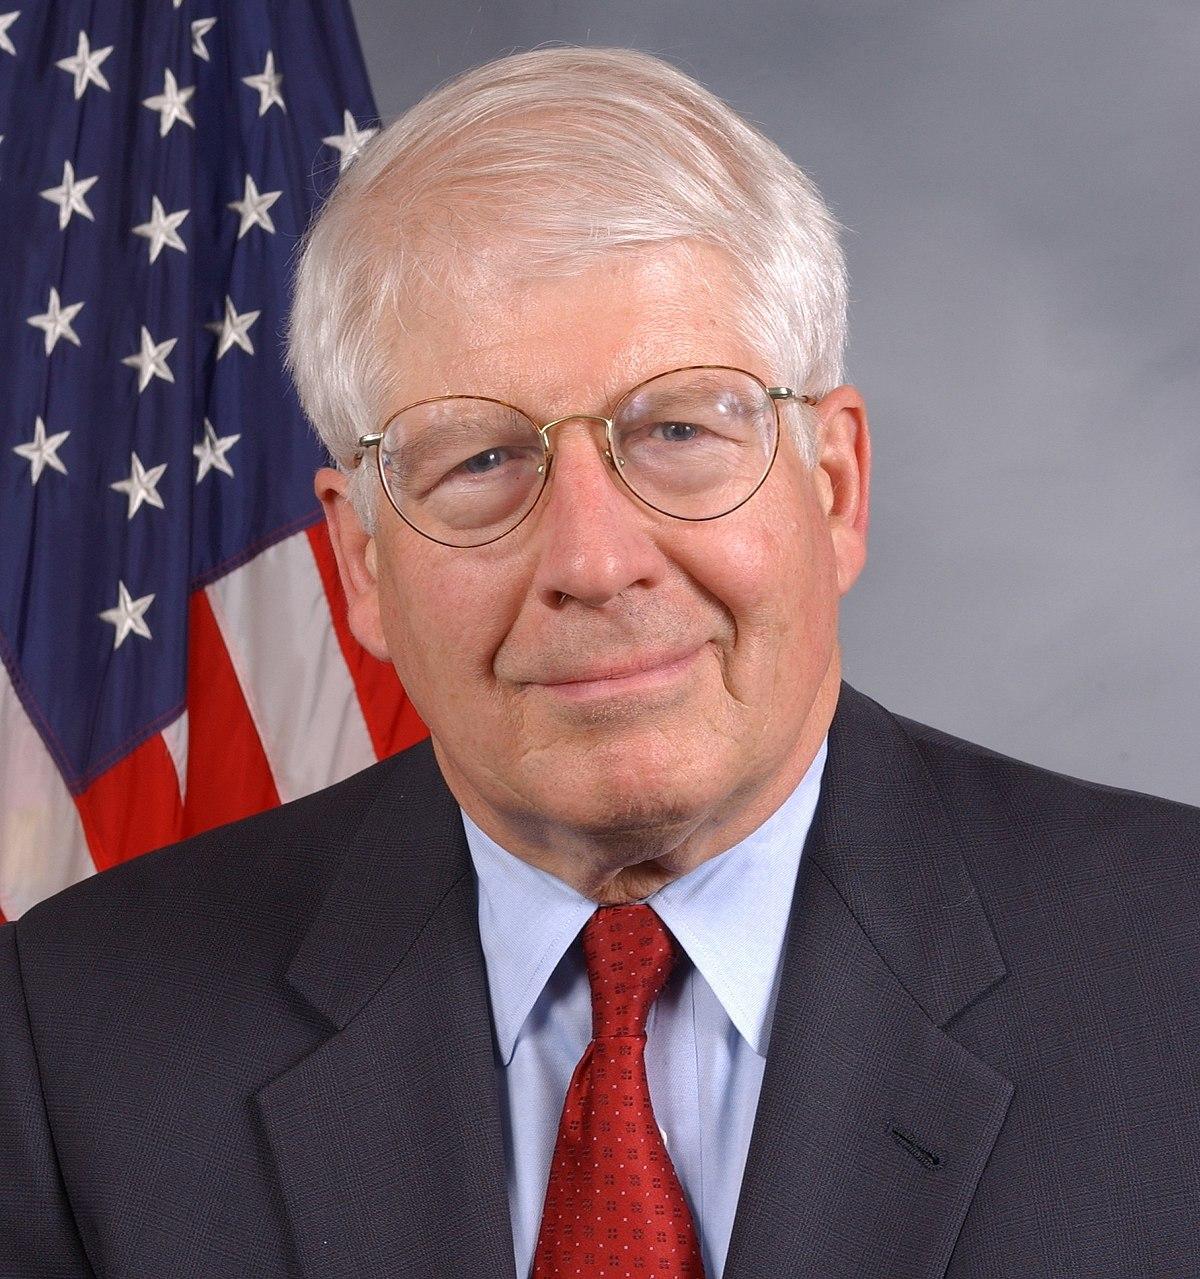 david price (u.s. politician) - wikipedia